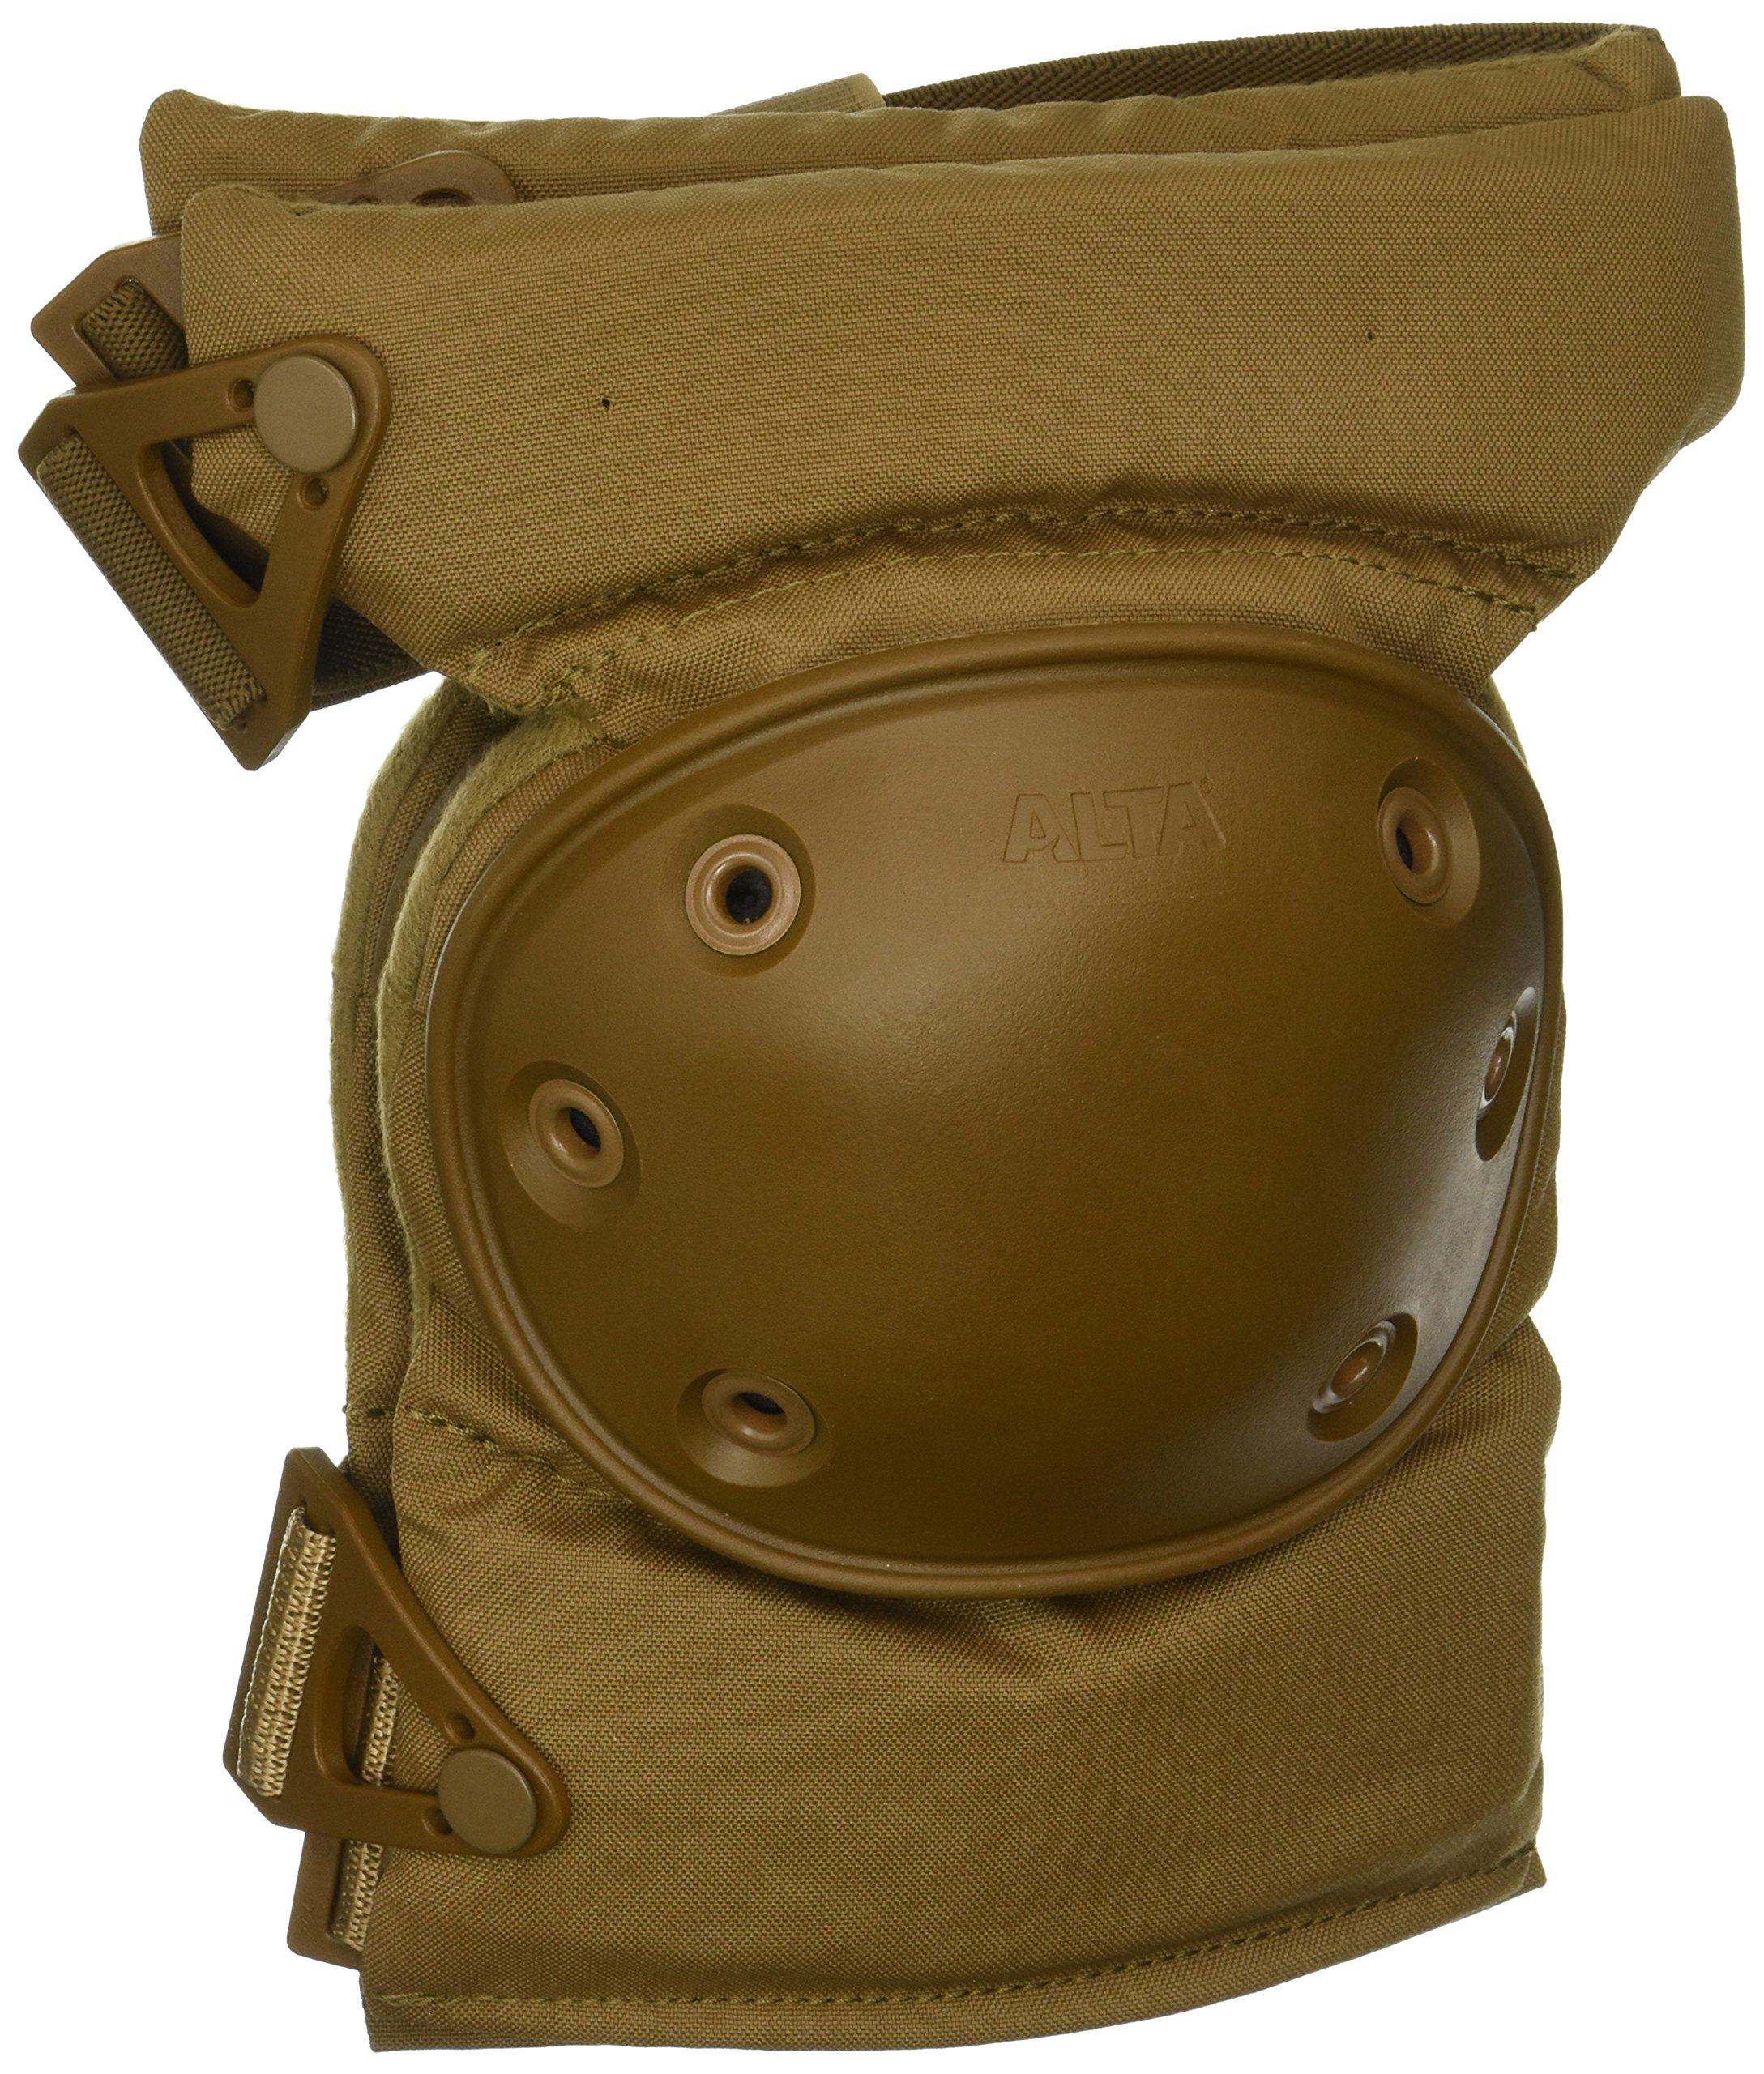 ALTA 52913.14 AltaCONTOUR Knee Protector Pad, Coyote Nylon Fabric, AltaLOK Fastening, Flexible Cap, Round, Coyote